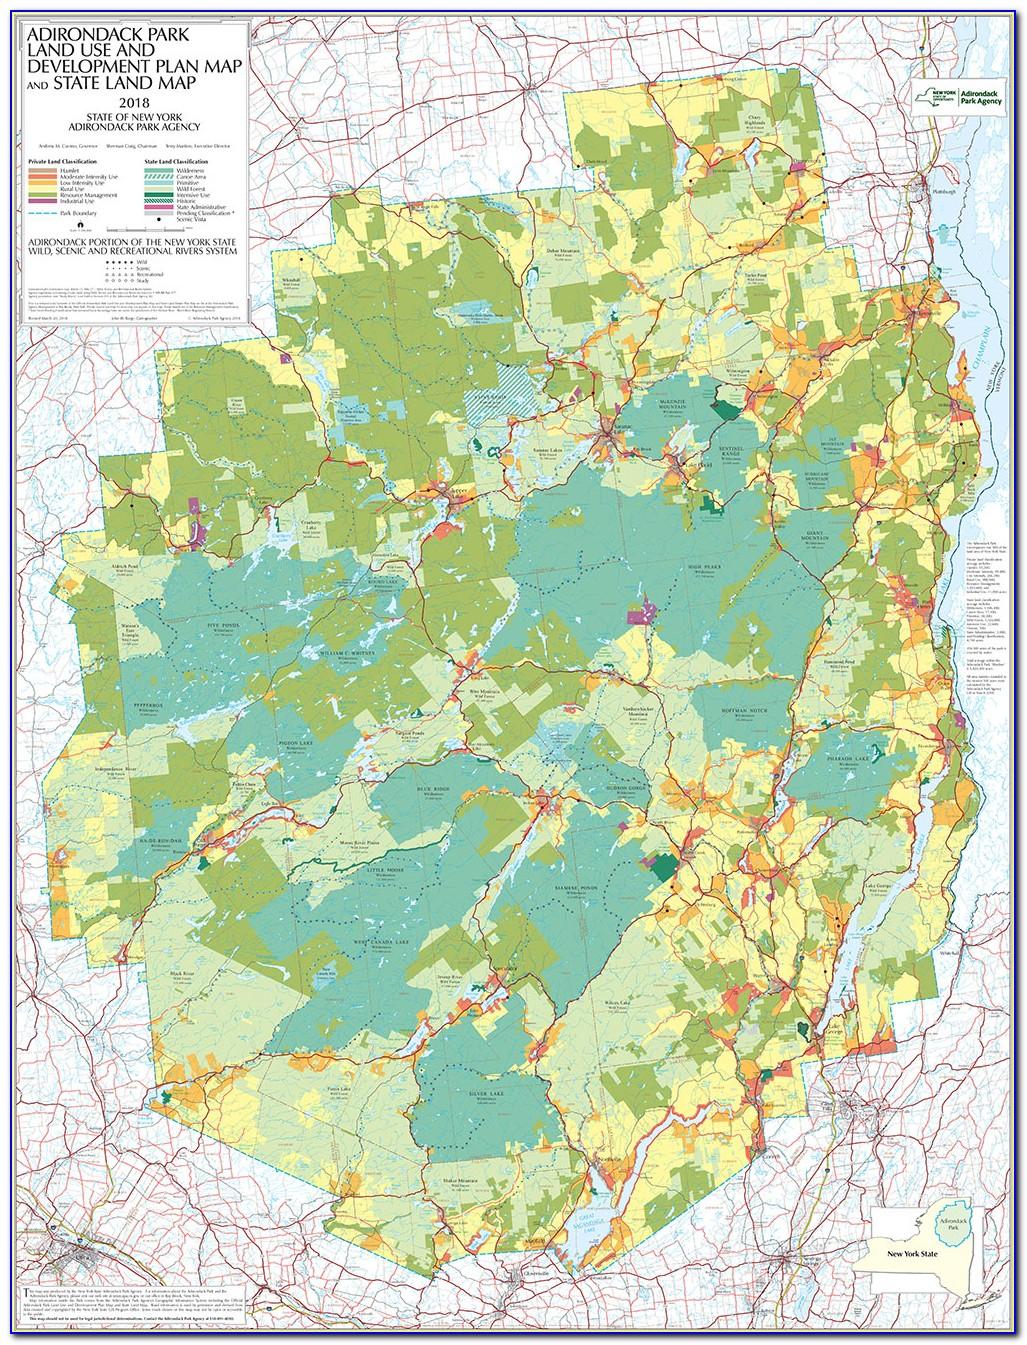 Adirondack Trail Map App